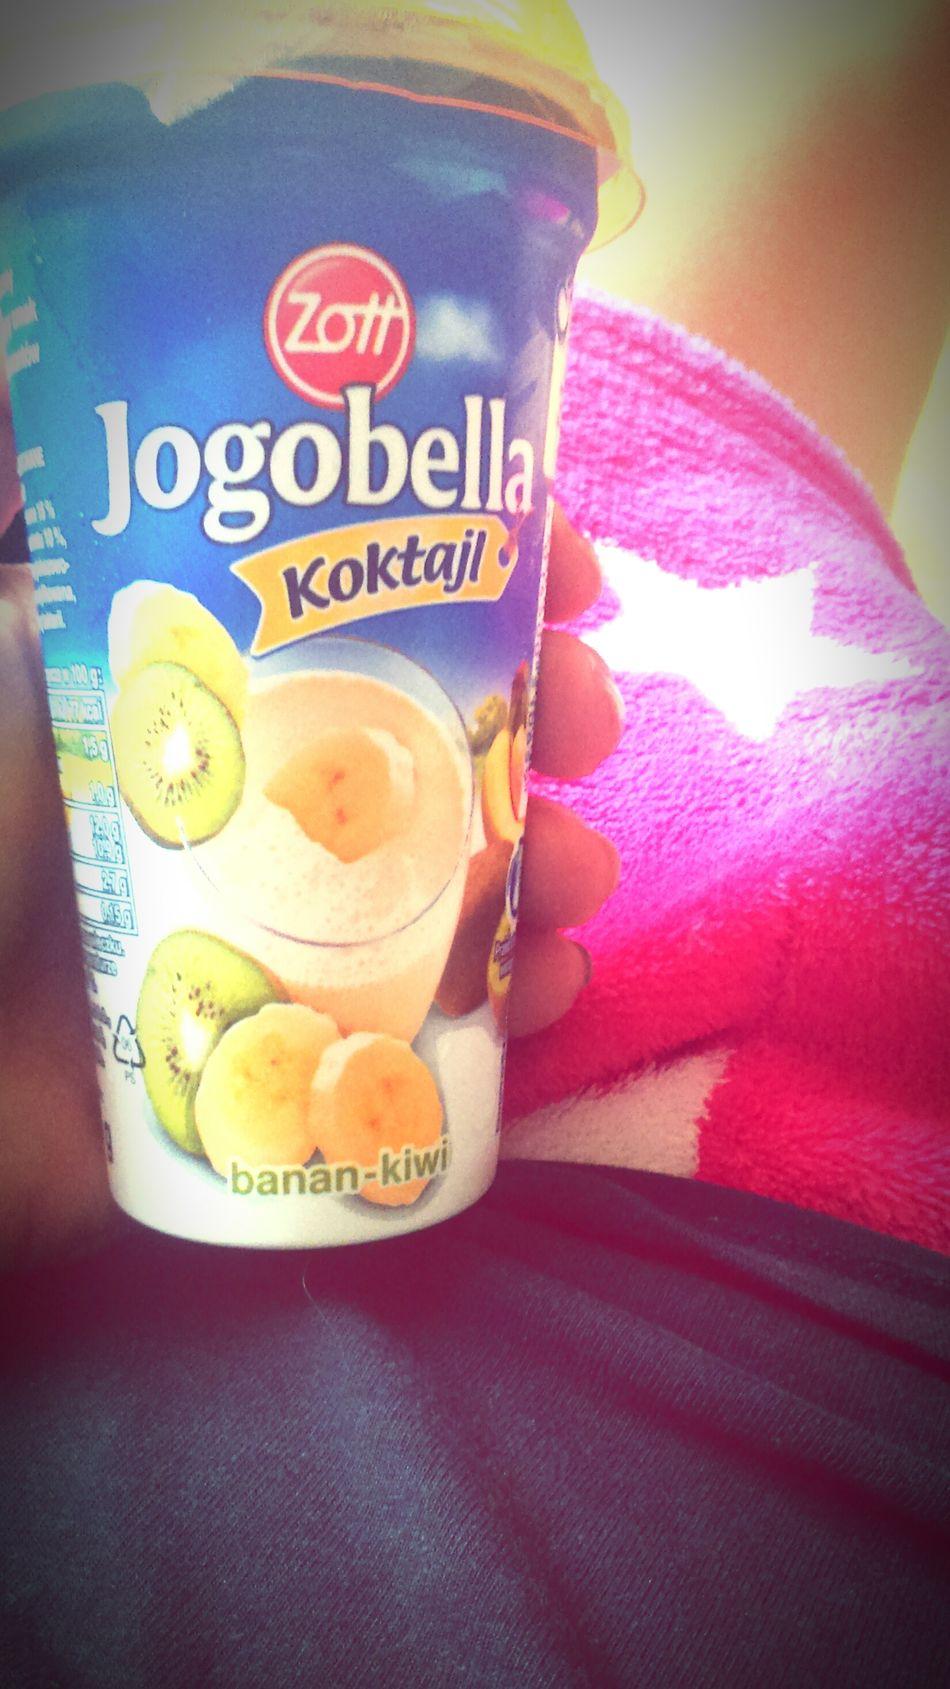 Yummy ✌ Zott Jogobella Banana Kiwi Yummy♡ Pychotka 😊😁😍 Koktajl Zdrowo !! To Podstawa :) Fit 😎